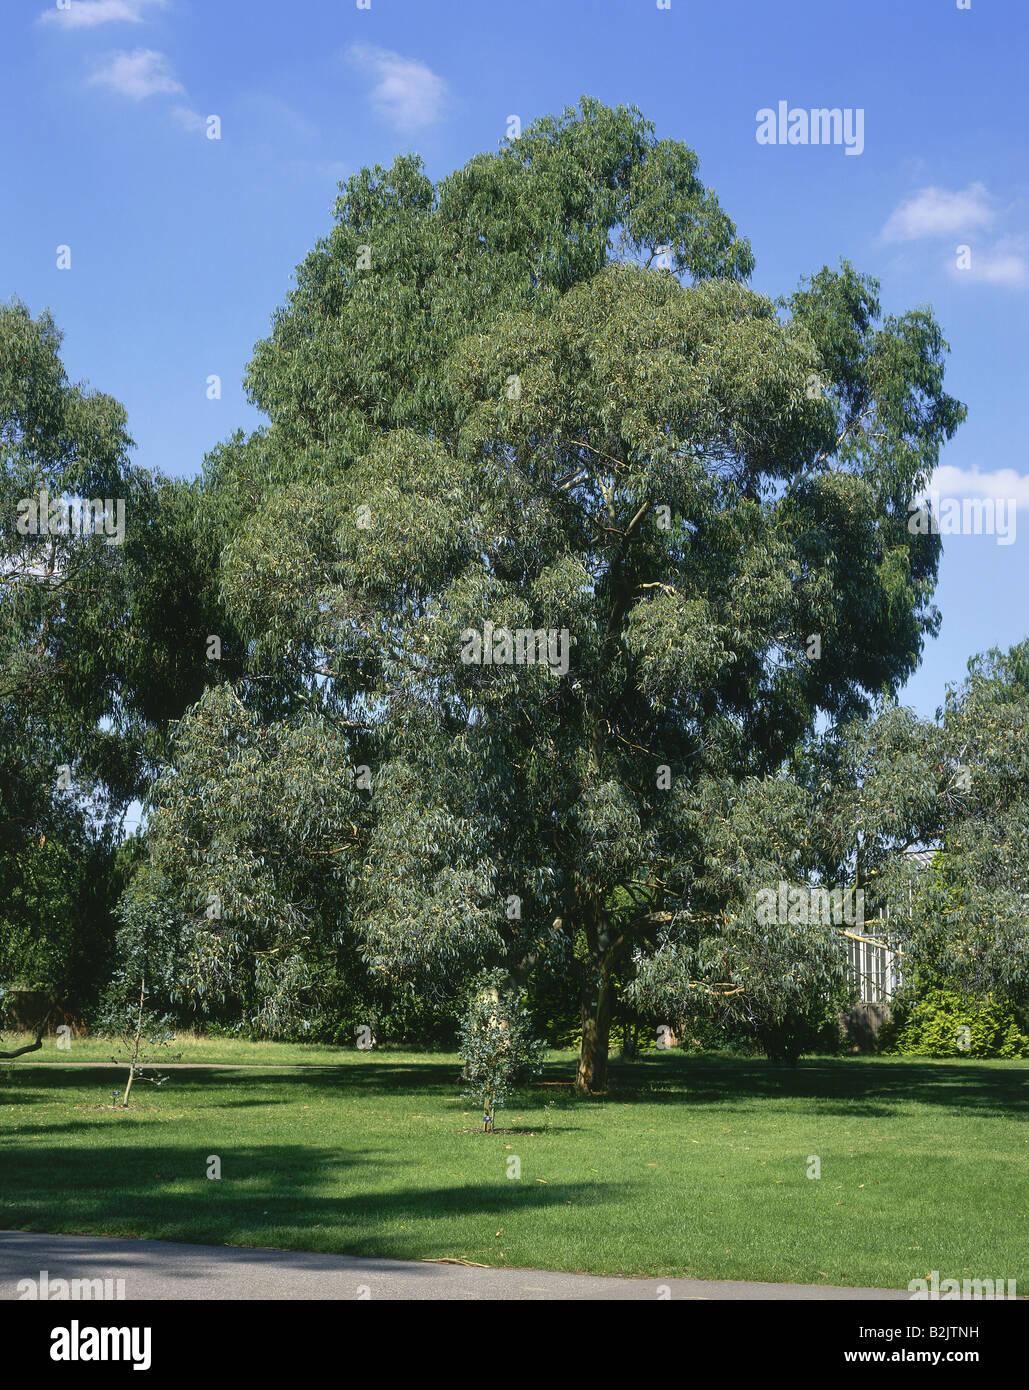 botaniy, Eucalyptus glancescens, 'Tingiringi Gum' at Kew Gardens, London, Great Britain, Additional-Rights - Stock Image